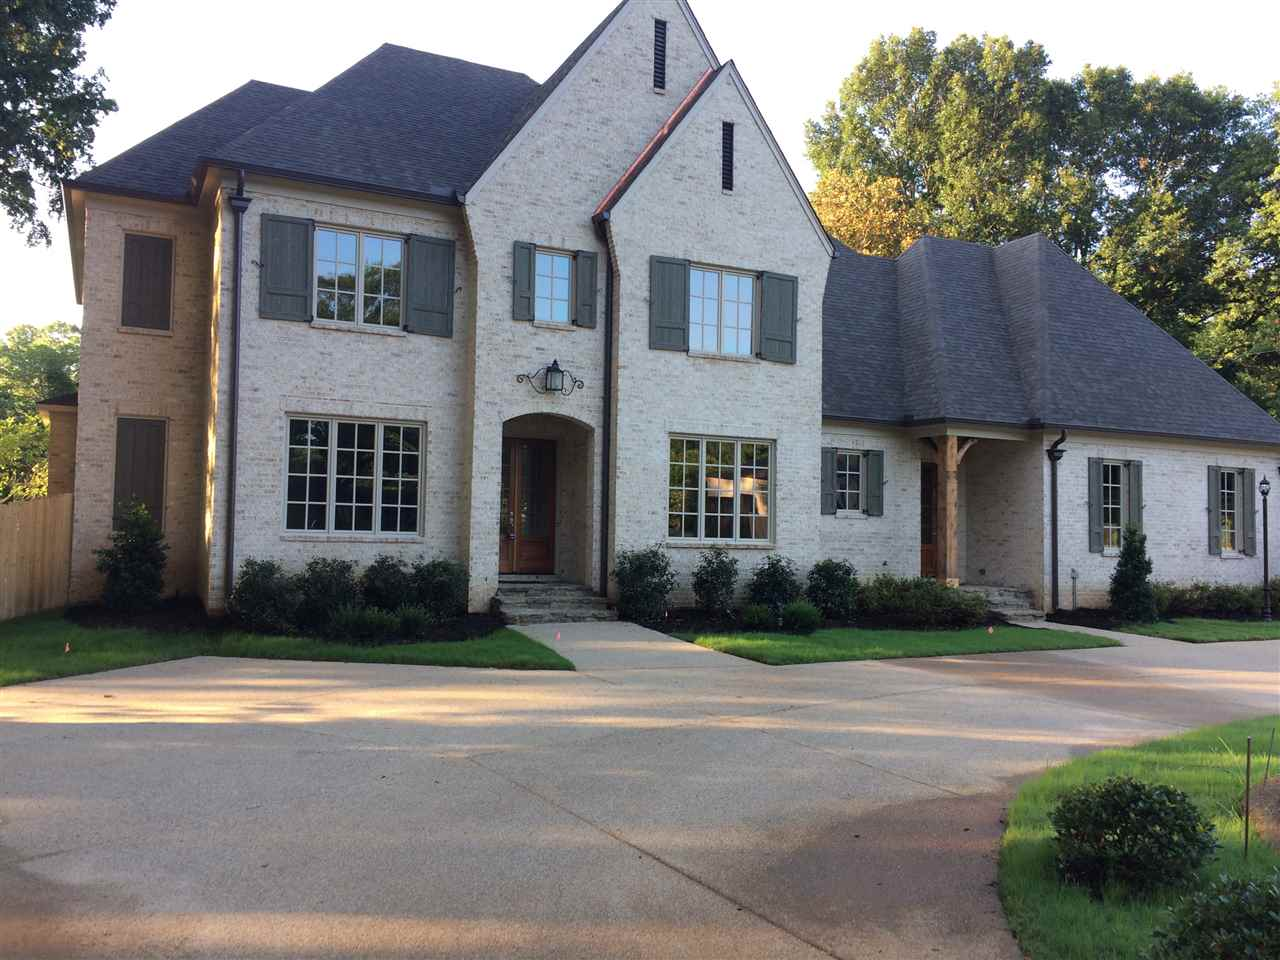 4969 Briarcliff Memphis, TN 38117 - MLS #: 10001466